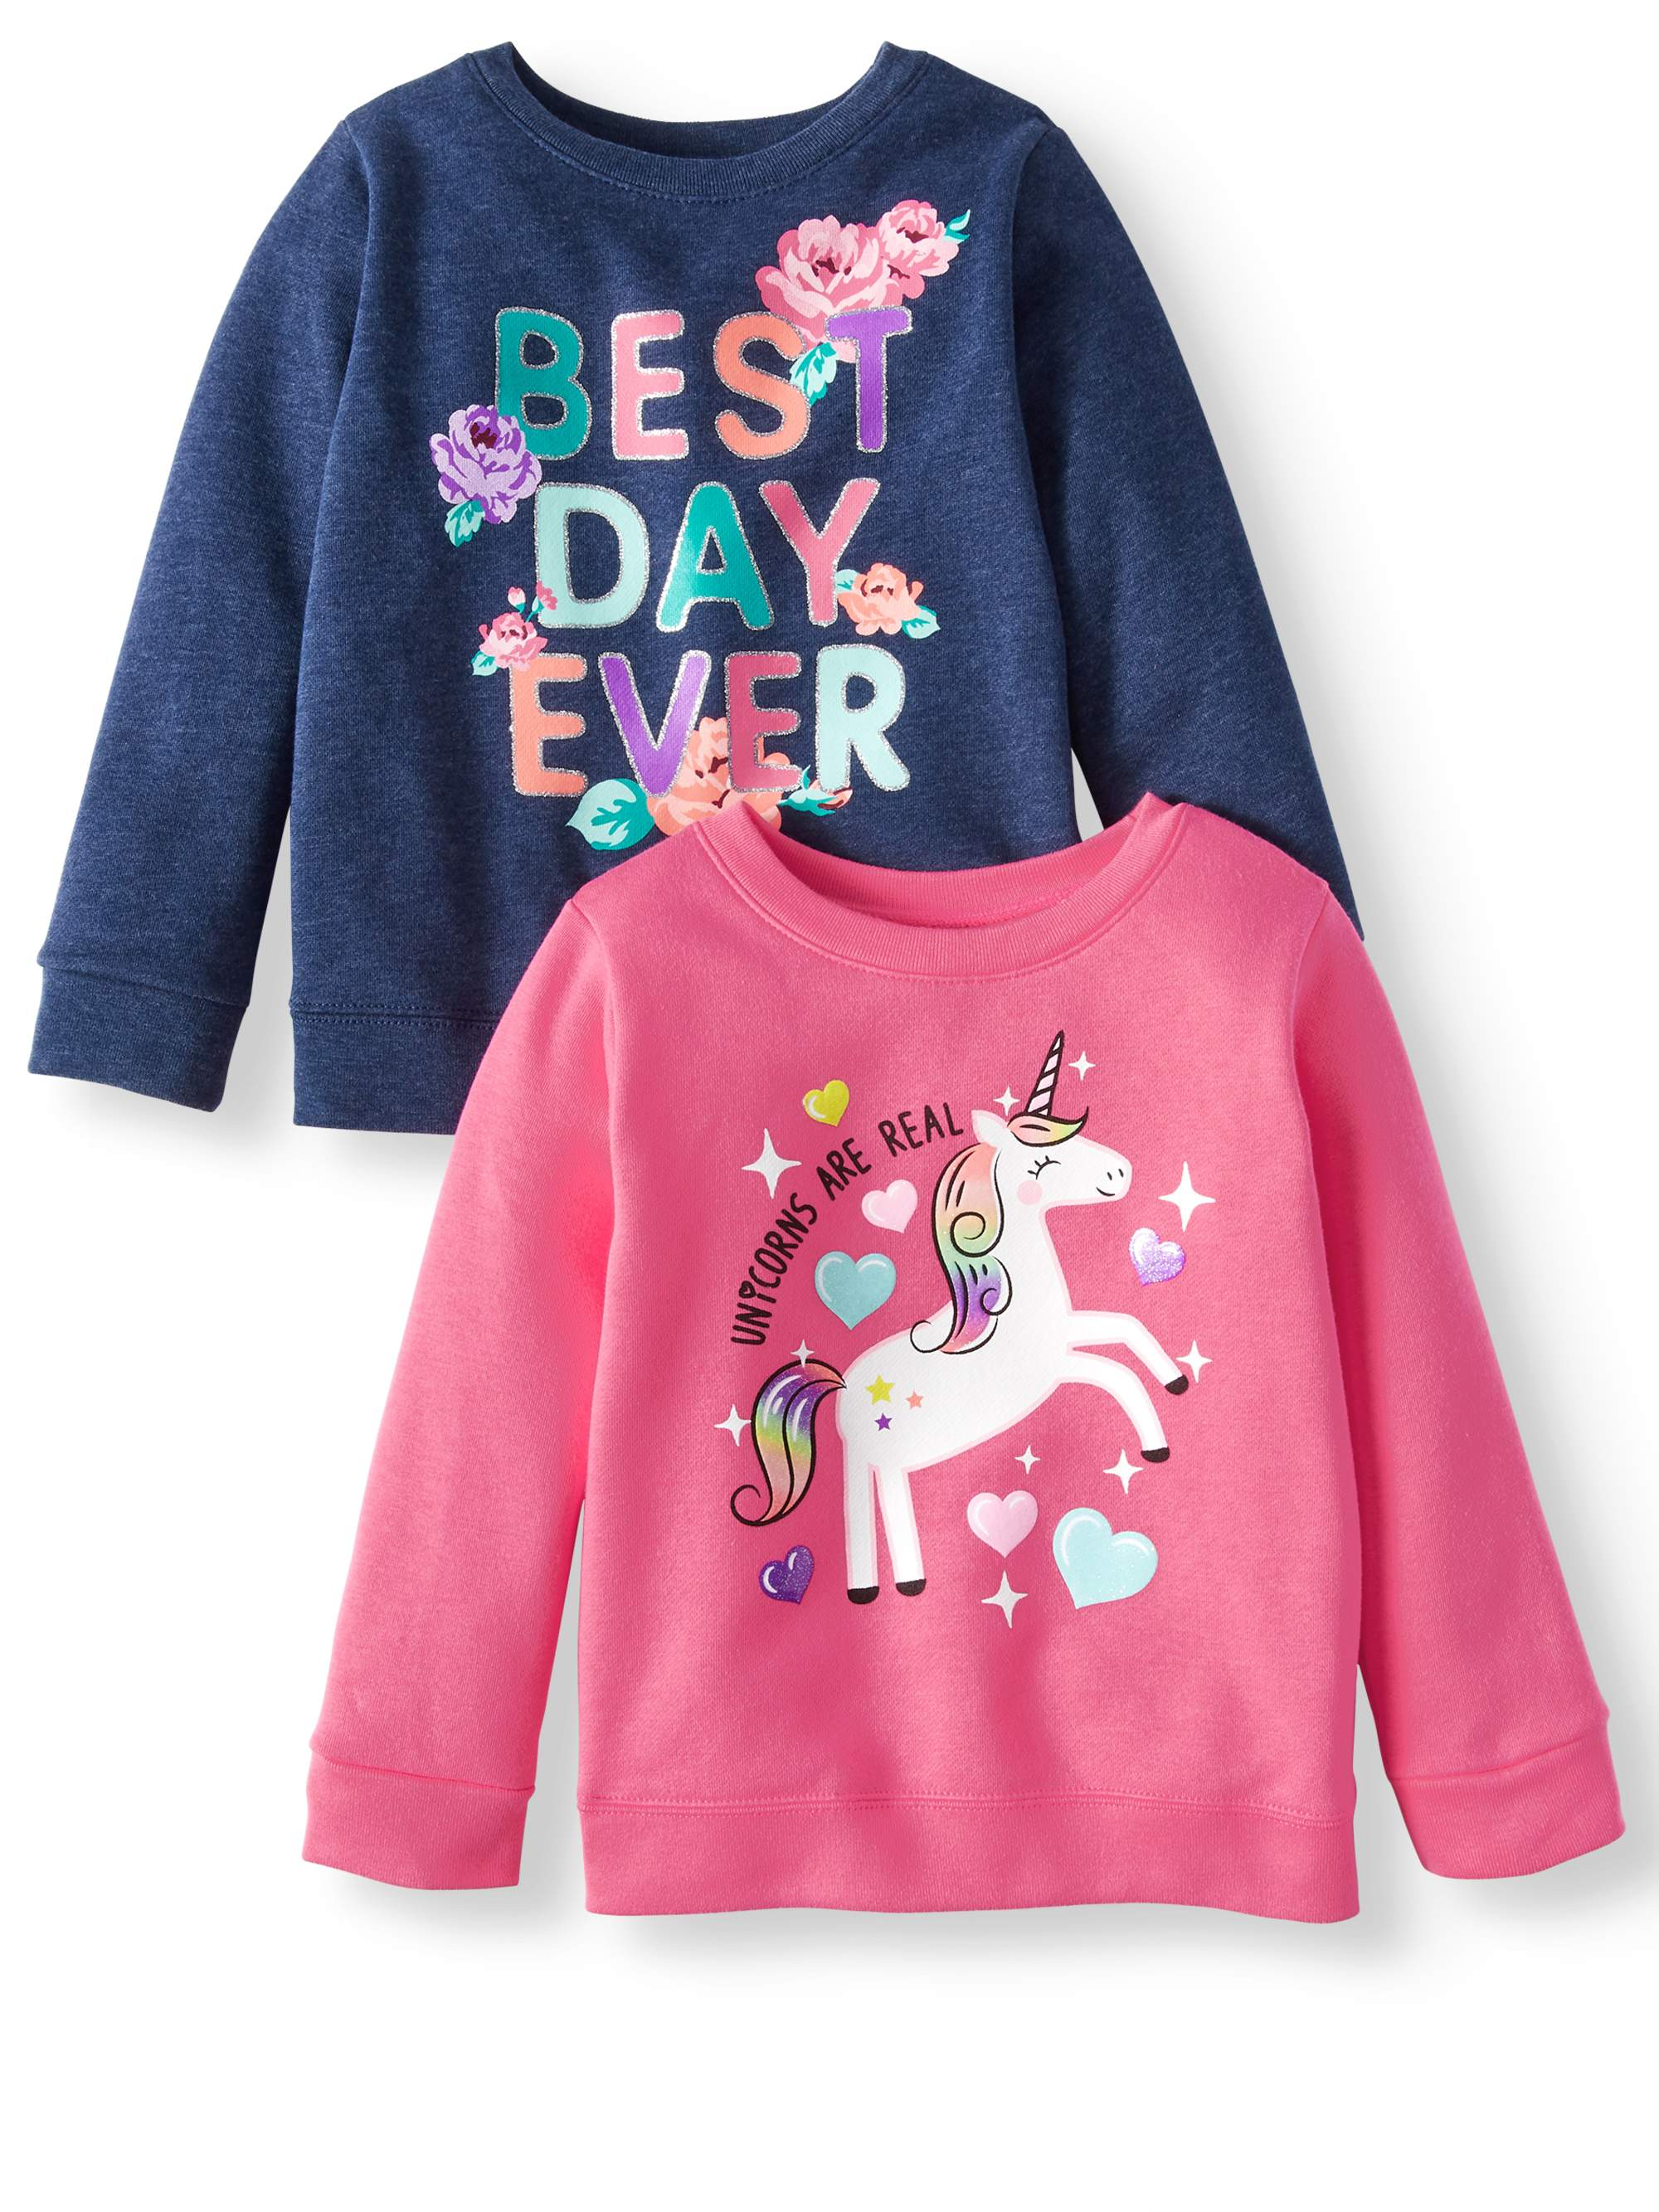 Graphic Sweatshirts, 2-pack (Toddler Girls)